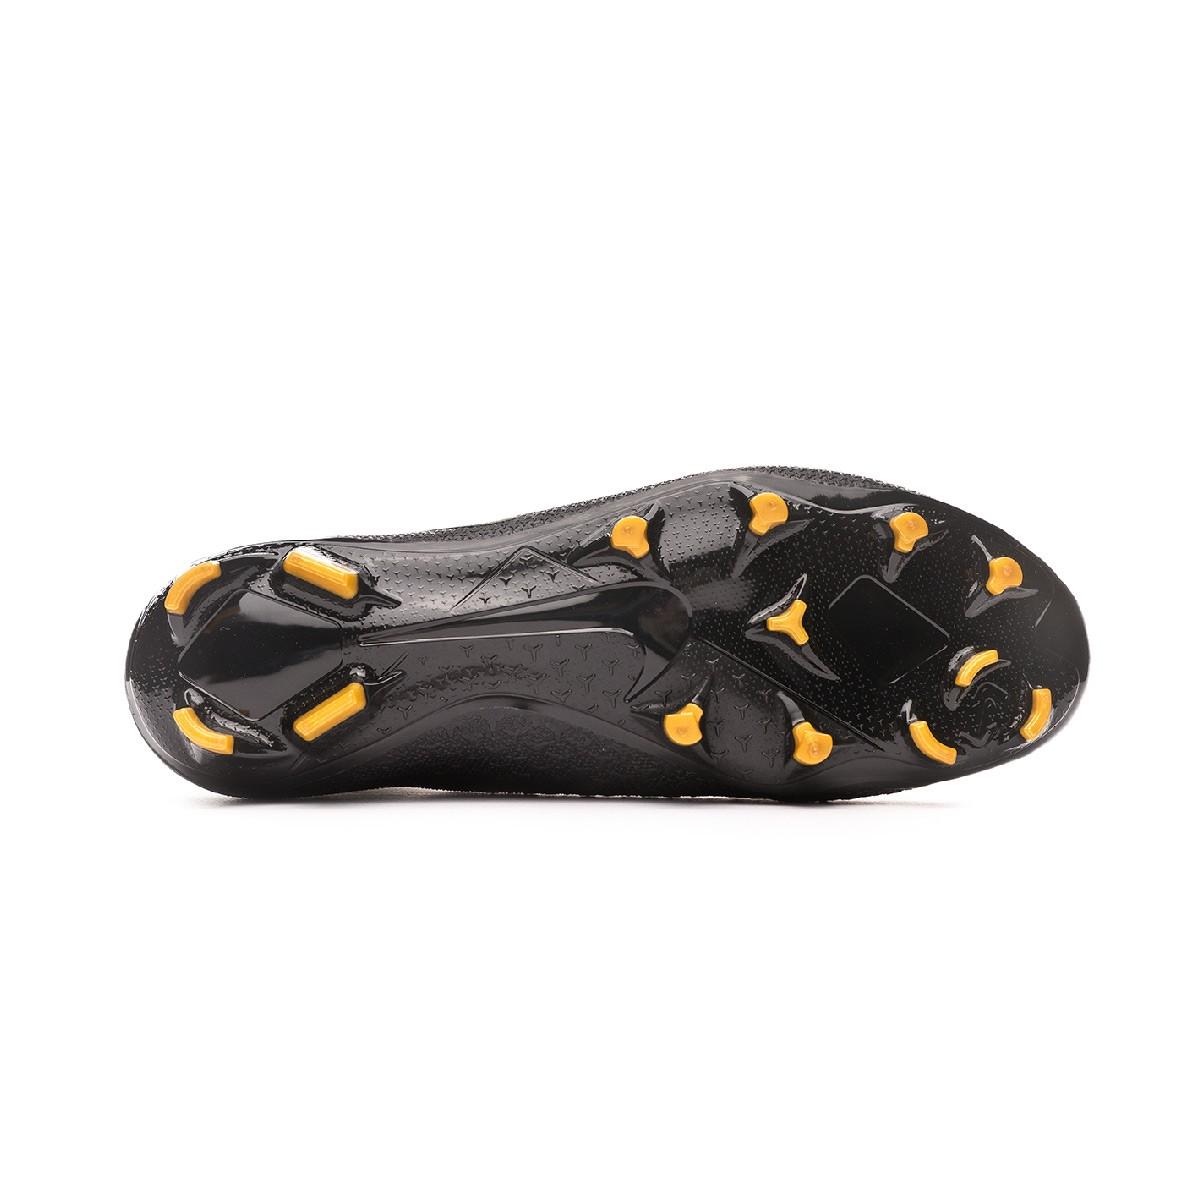 763d9801c839 Zapatos de fútbol Nike Phantom Vision Elite DF FG Black-Metallic vivid gold  - Tienda de fútbol Fútbol Emotion